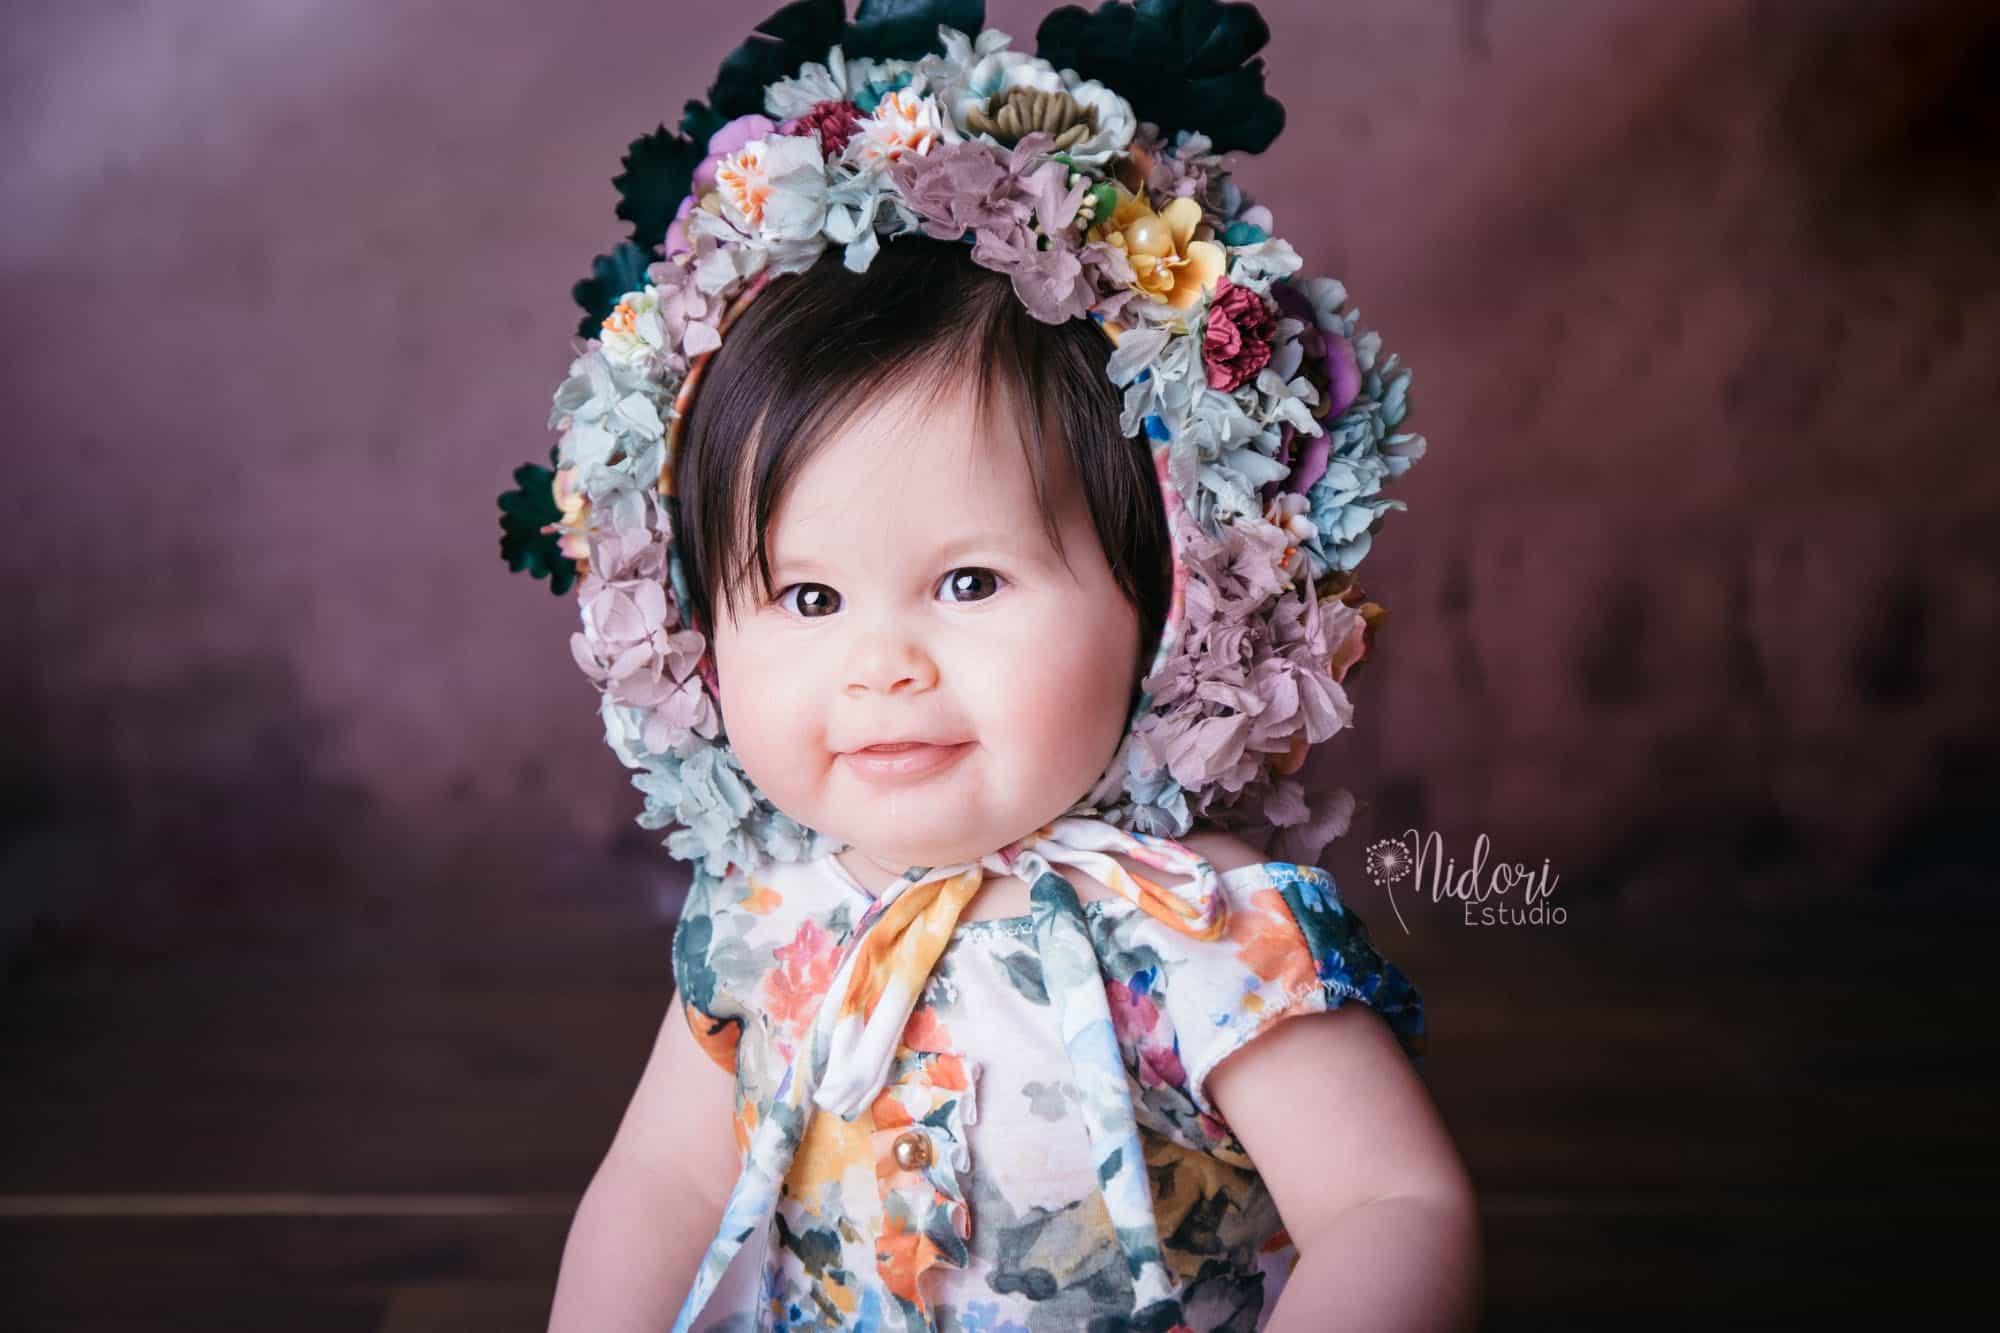 seguimiento-fotografia-niños-bebes-nidoriestudio-fotos-valencia-almazora-castellon-españa-spain-28